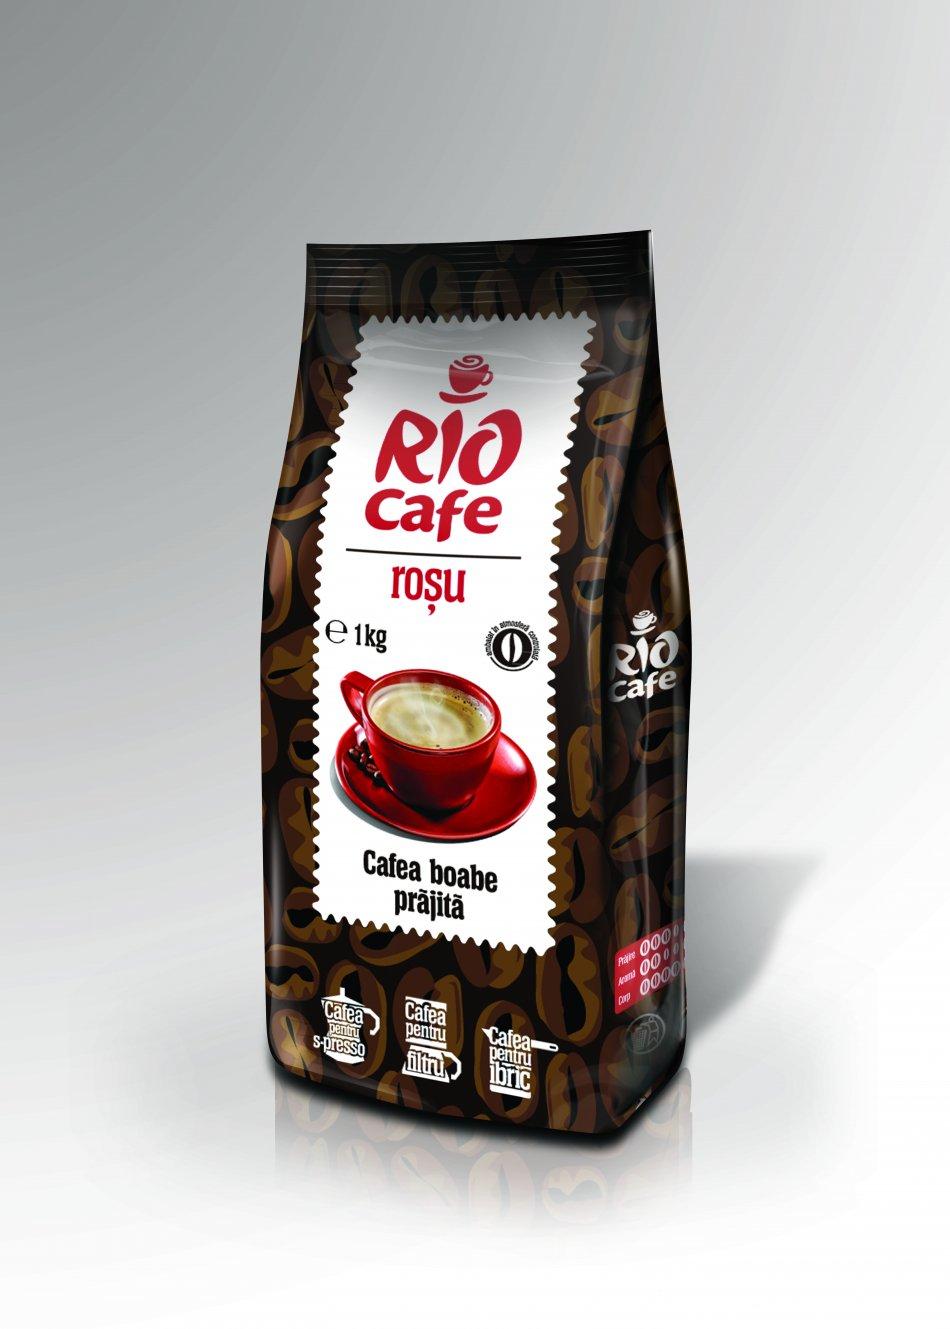 RIO cafe rosu 1 Kg.